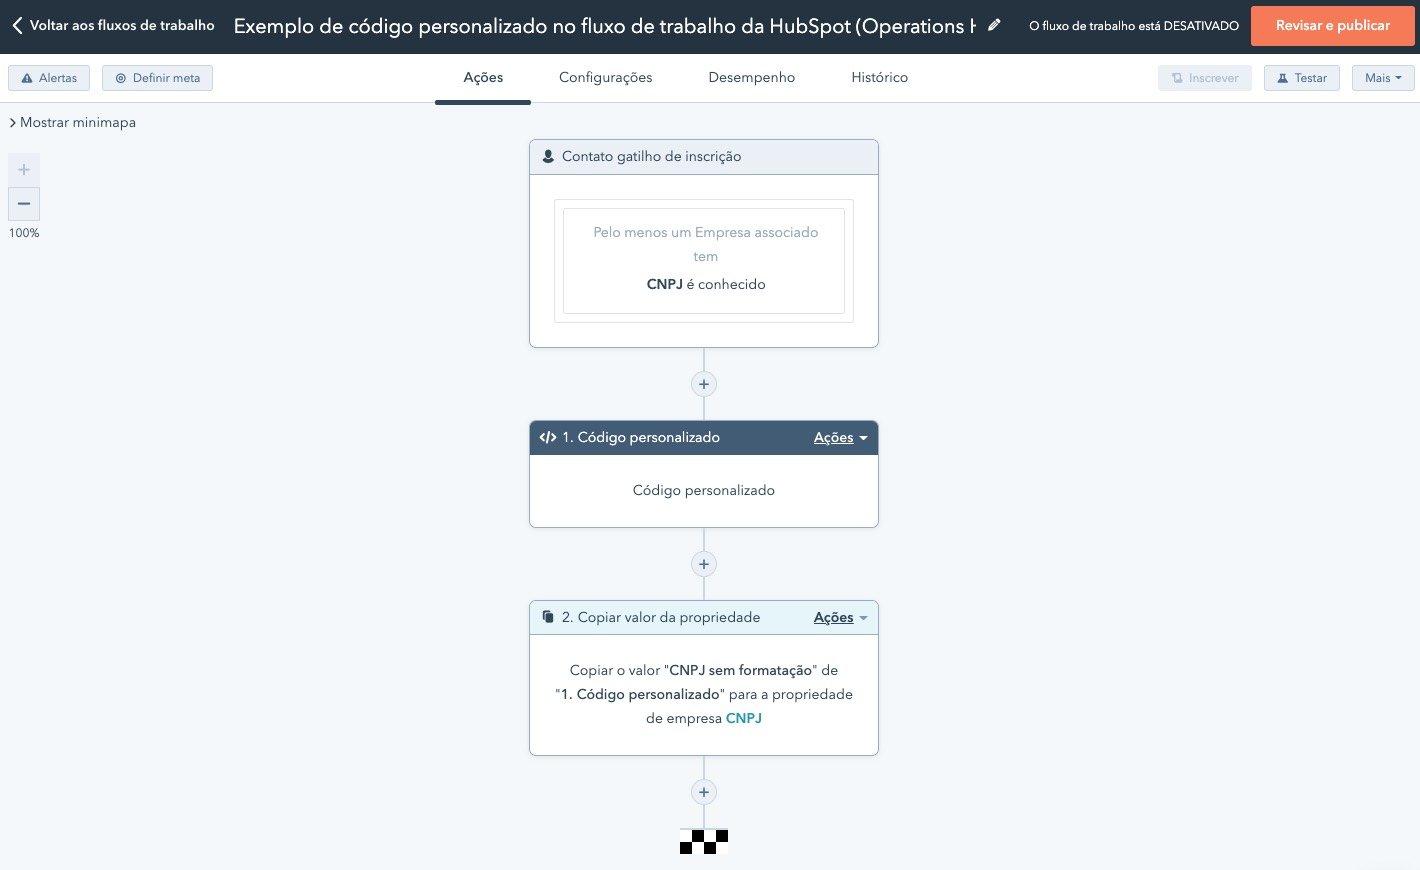 exemplo-codigo-personalizado-fluxo-de-trabalho-hubspot-operations-hub